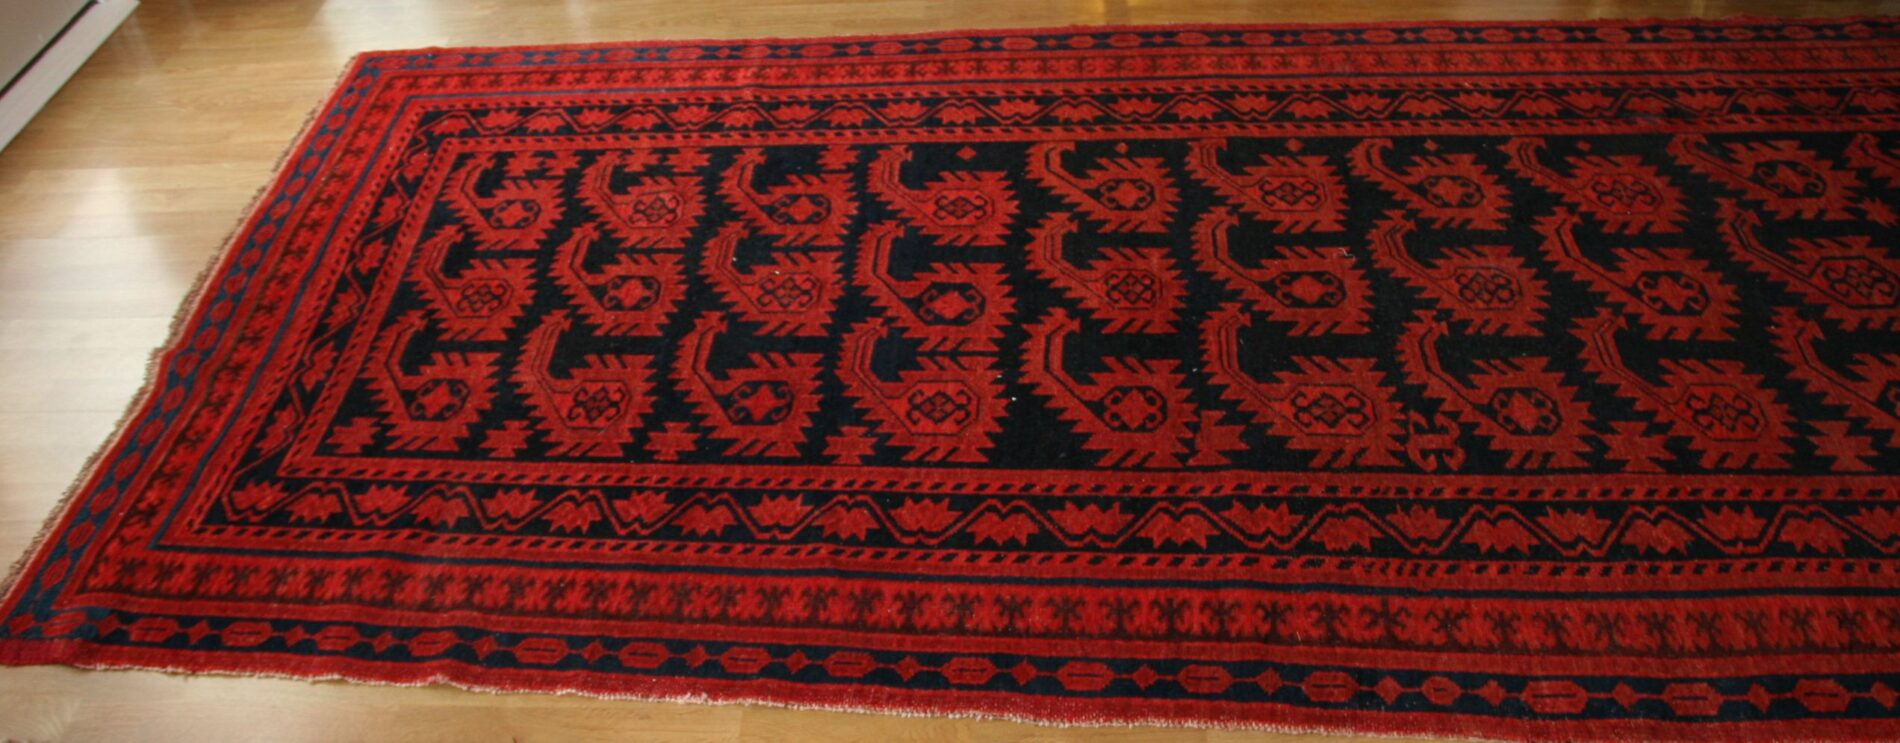 Unique Kyrgyz Rug with Botehs. © Sharon Lundahl